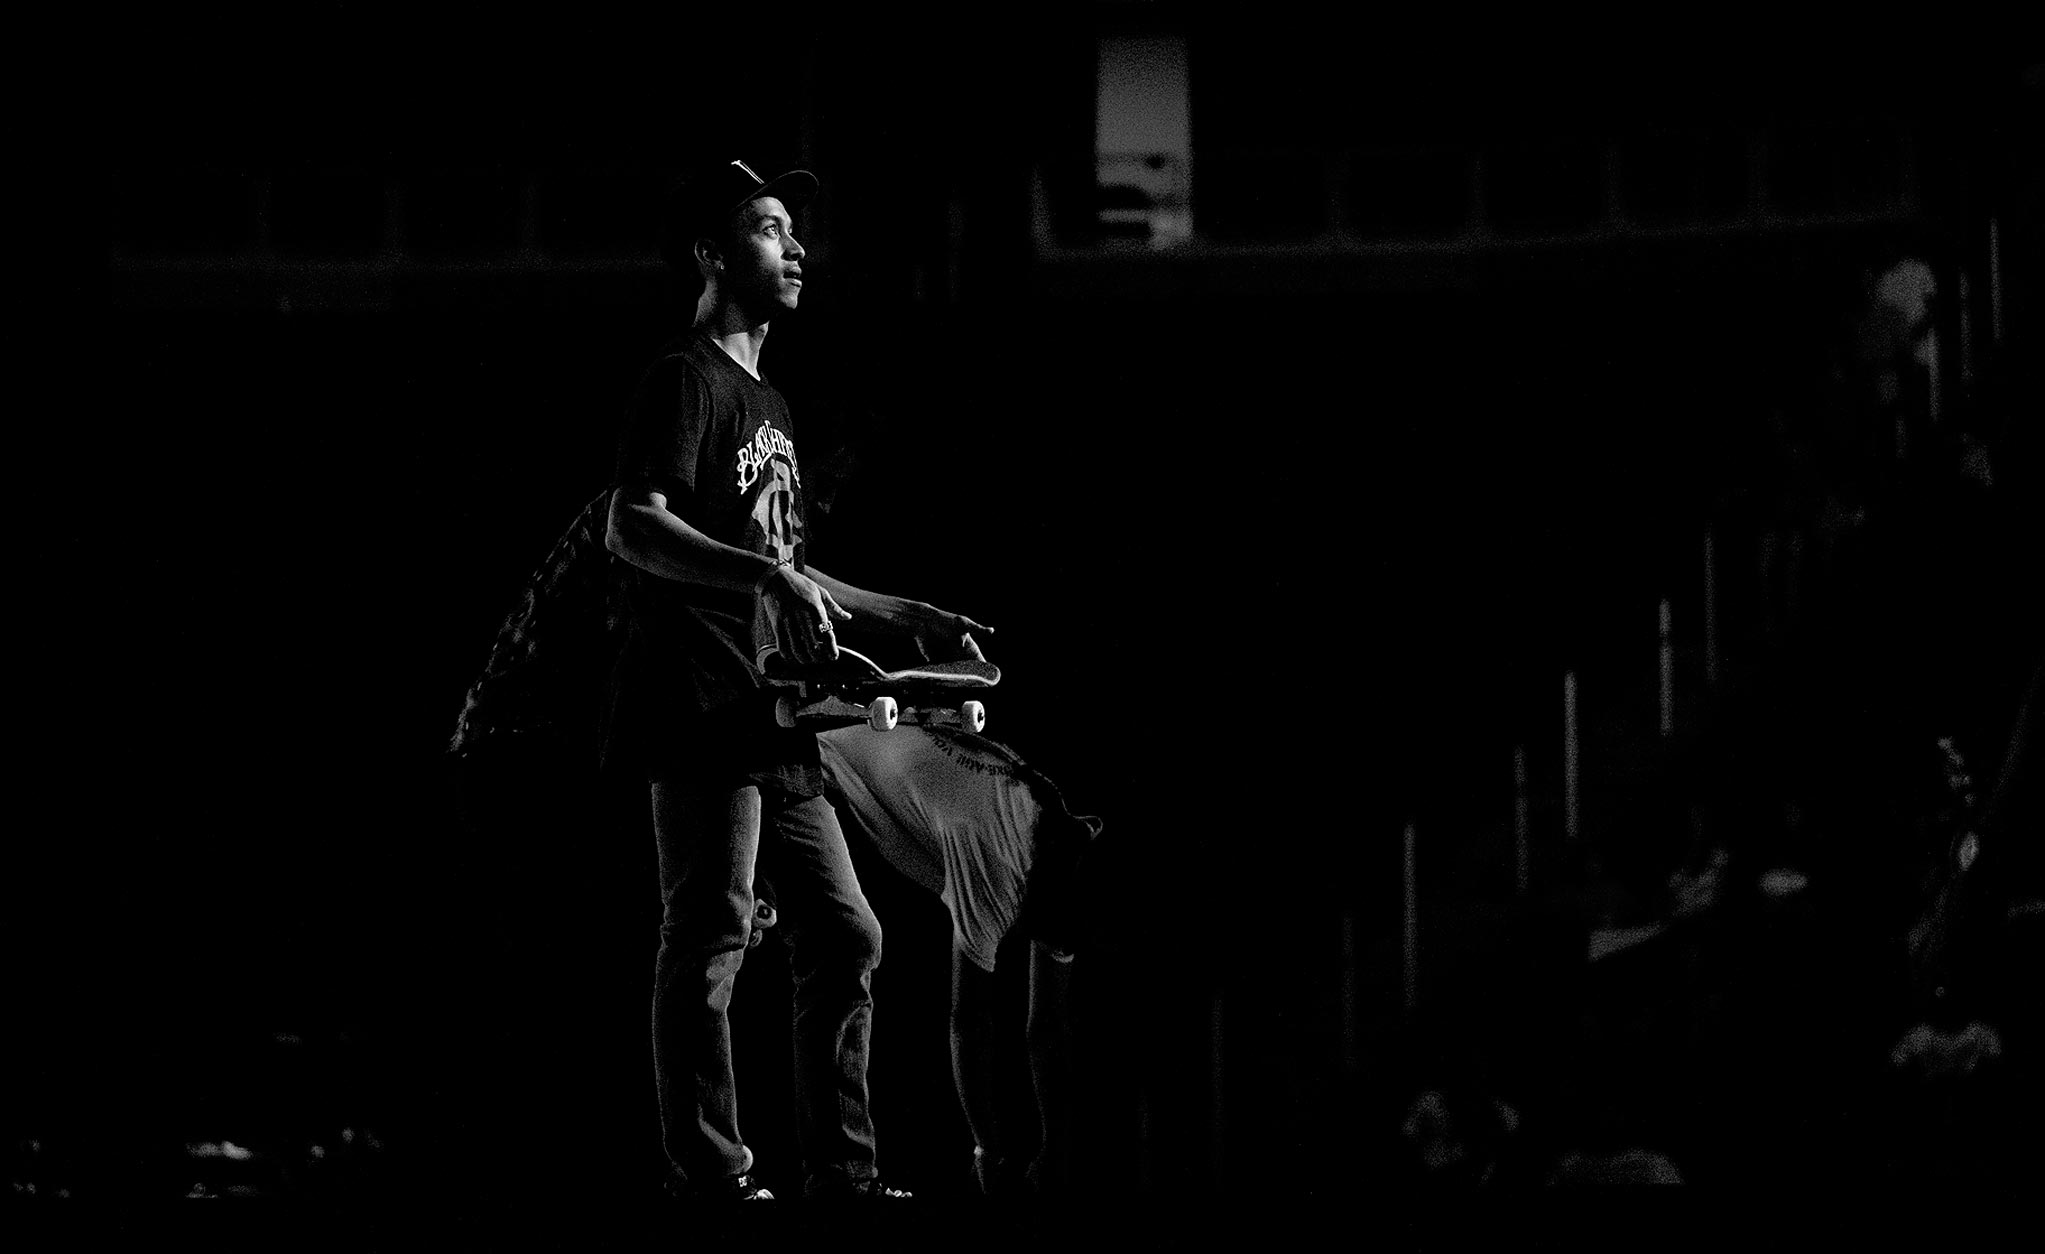 Nyjah Huston in the spotlight during the Arizona stop of Street League.